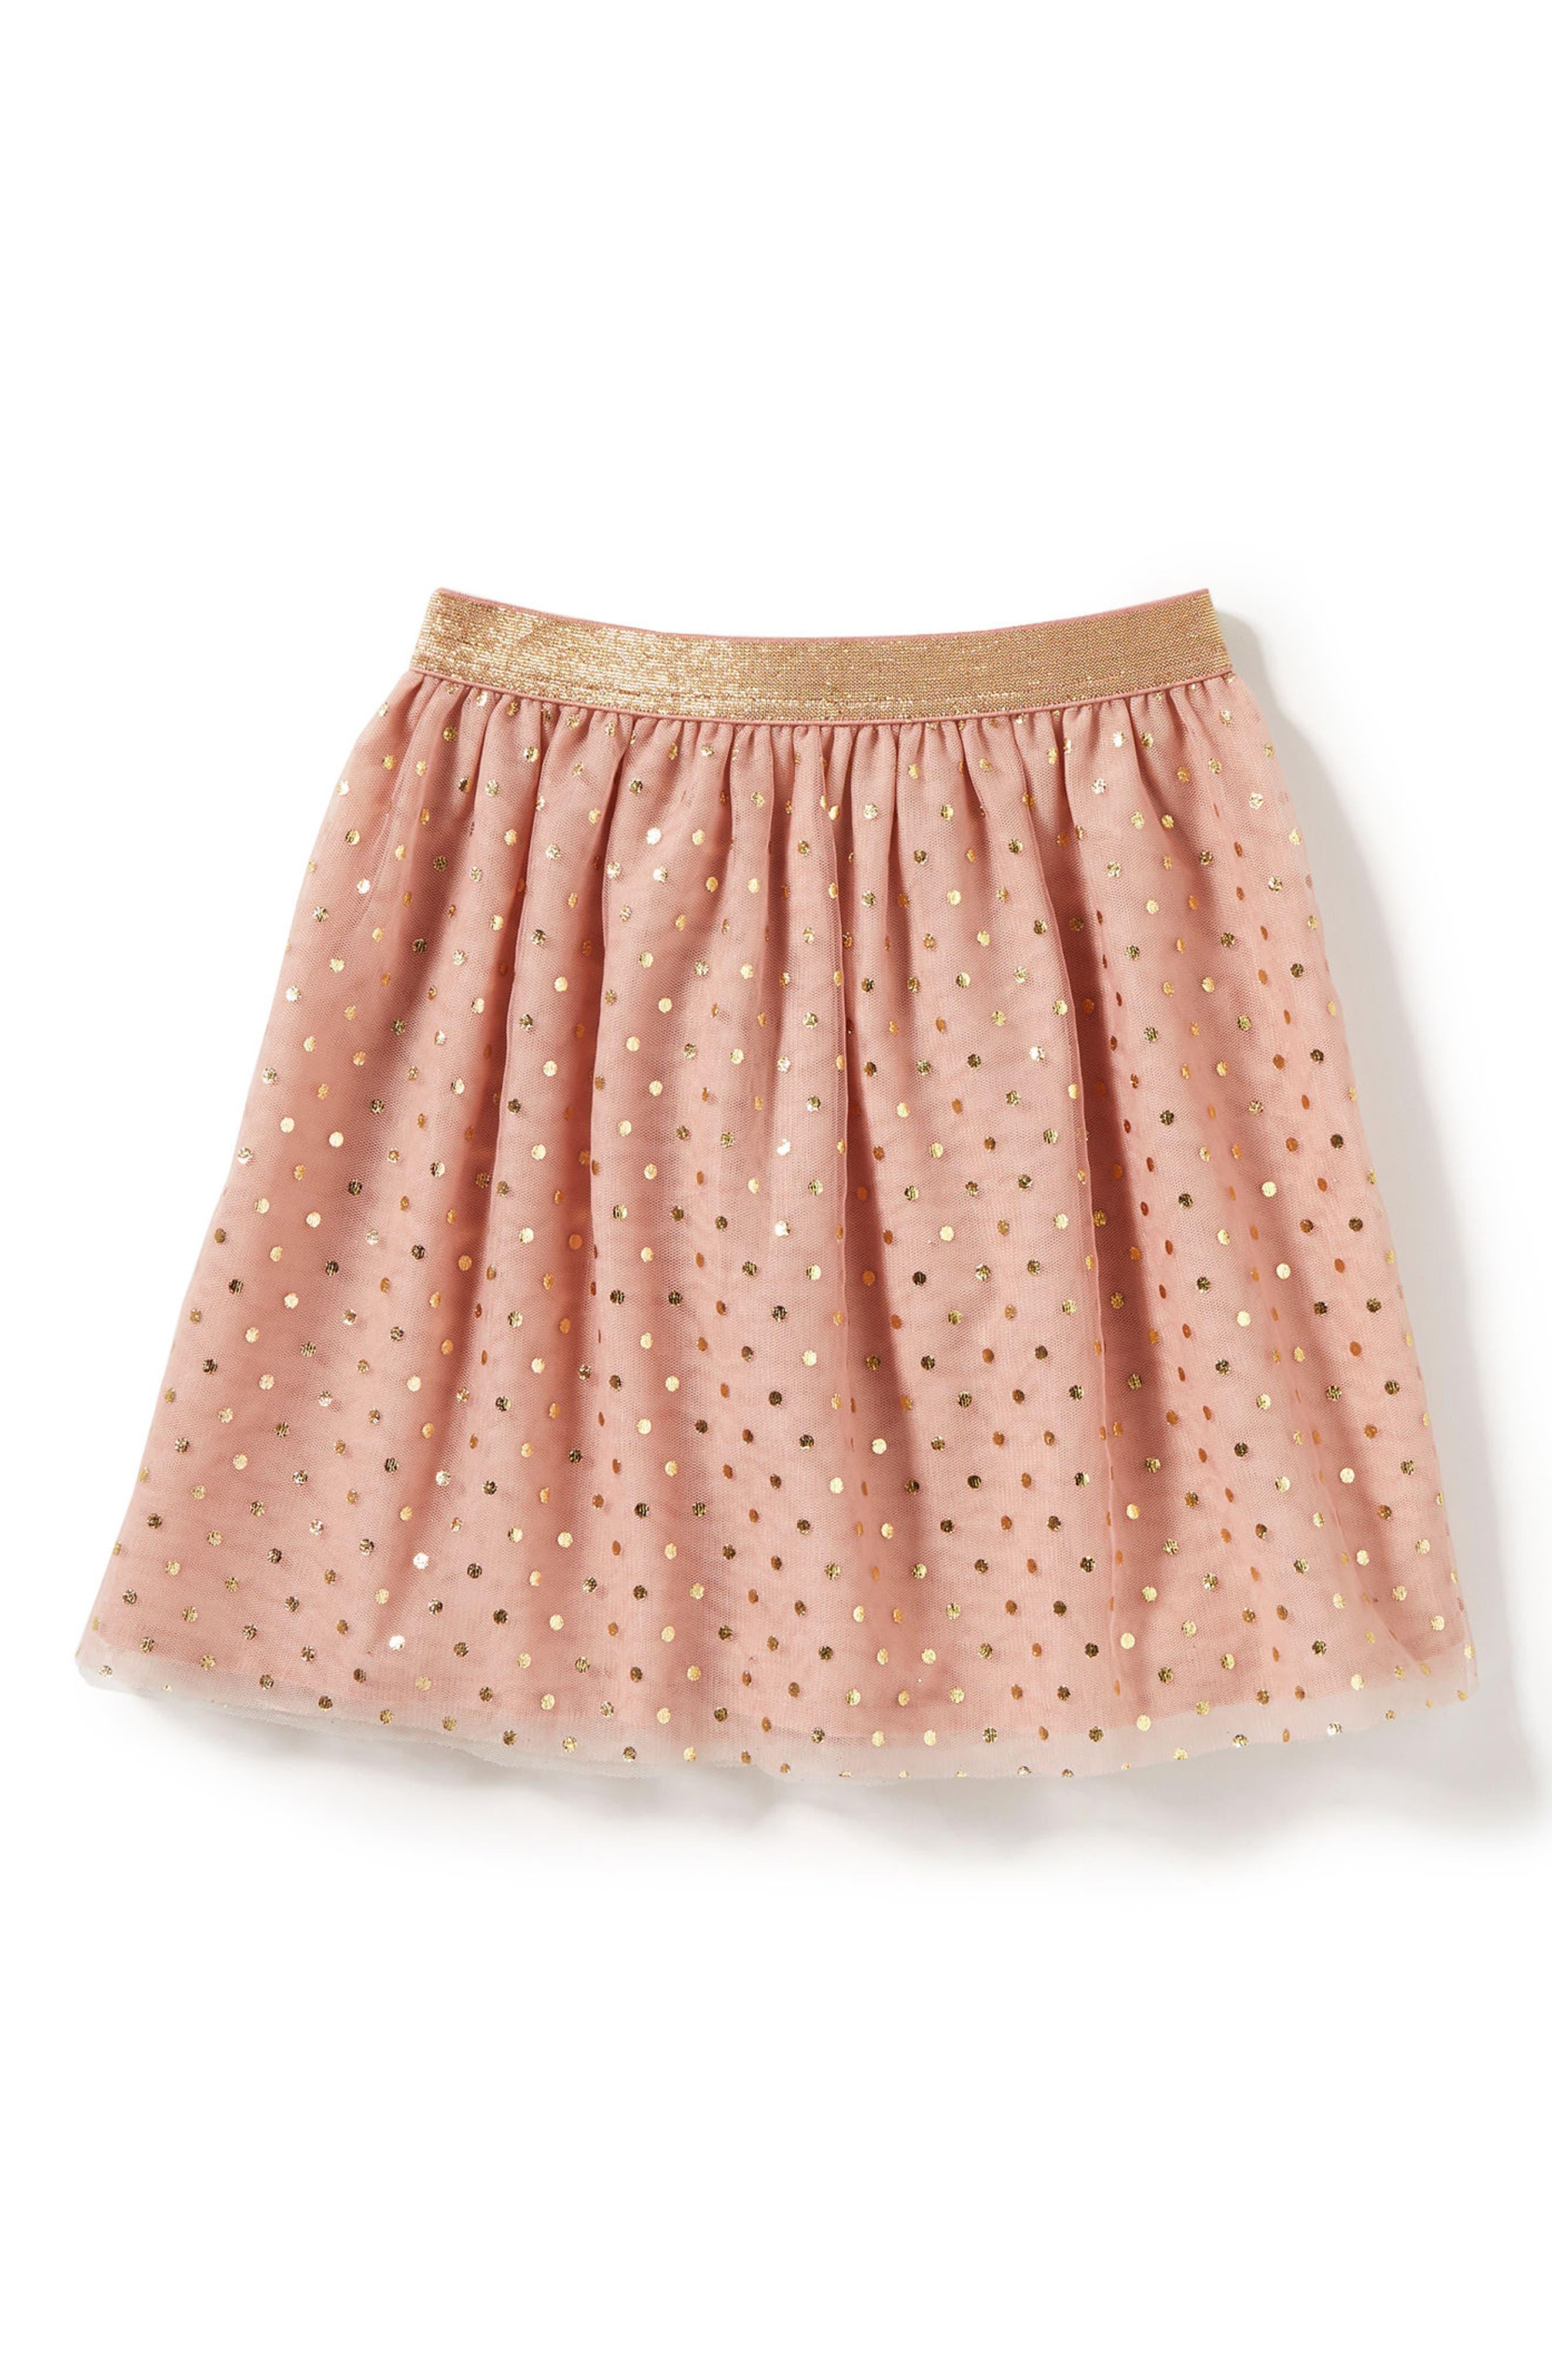 Belle Polka Dot Mesh Skirt,                             Main thumbnail 1, color,                             Pink